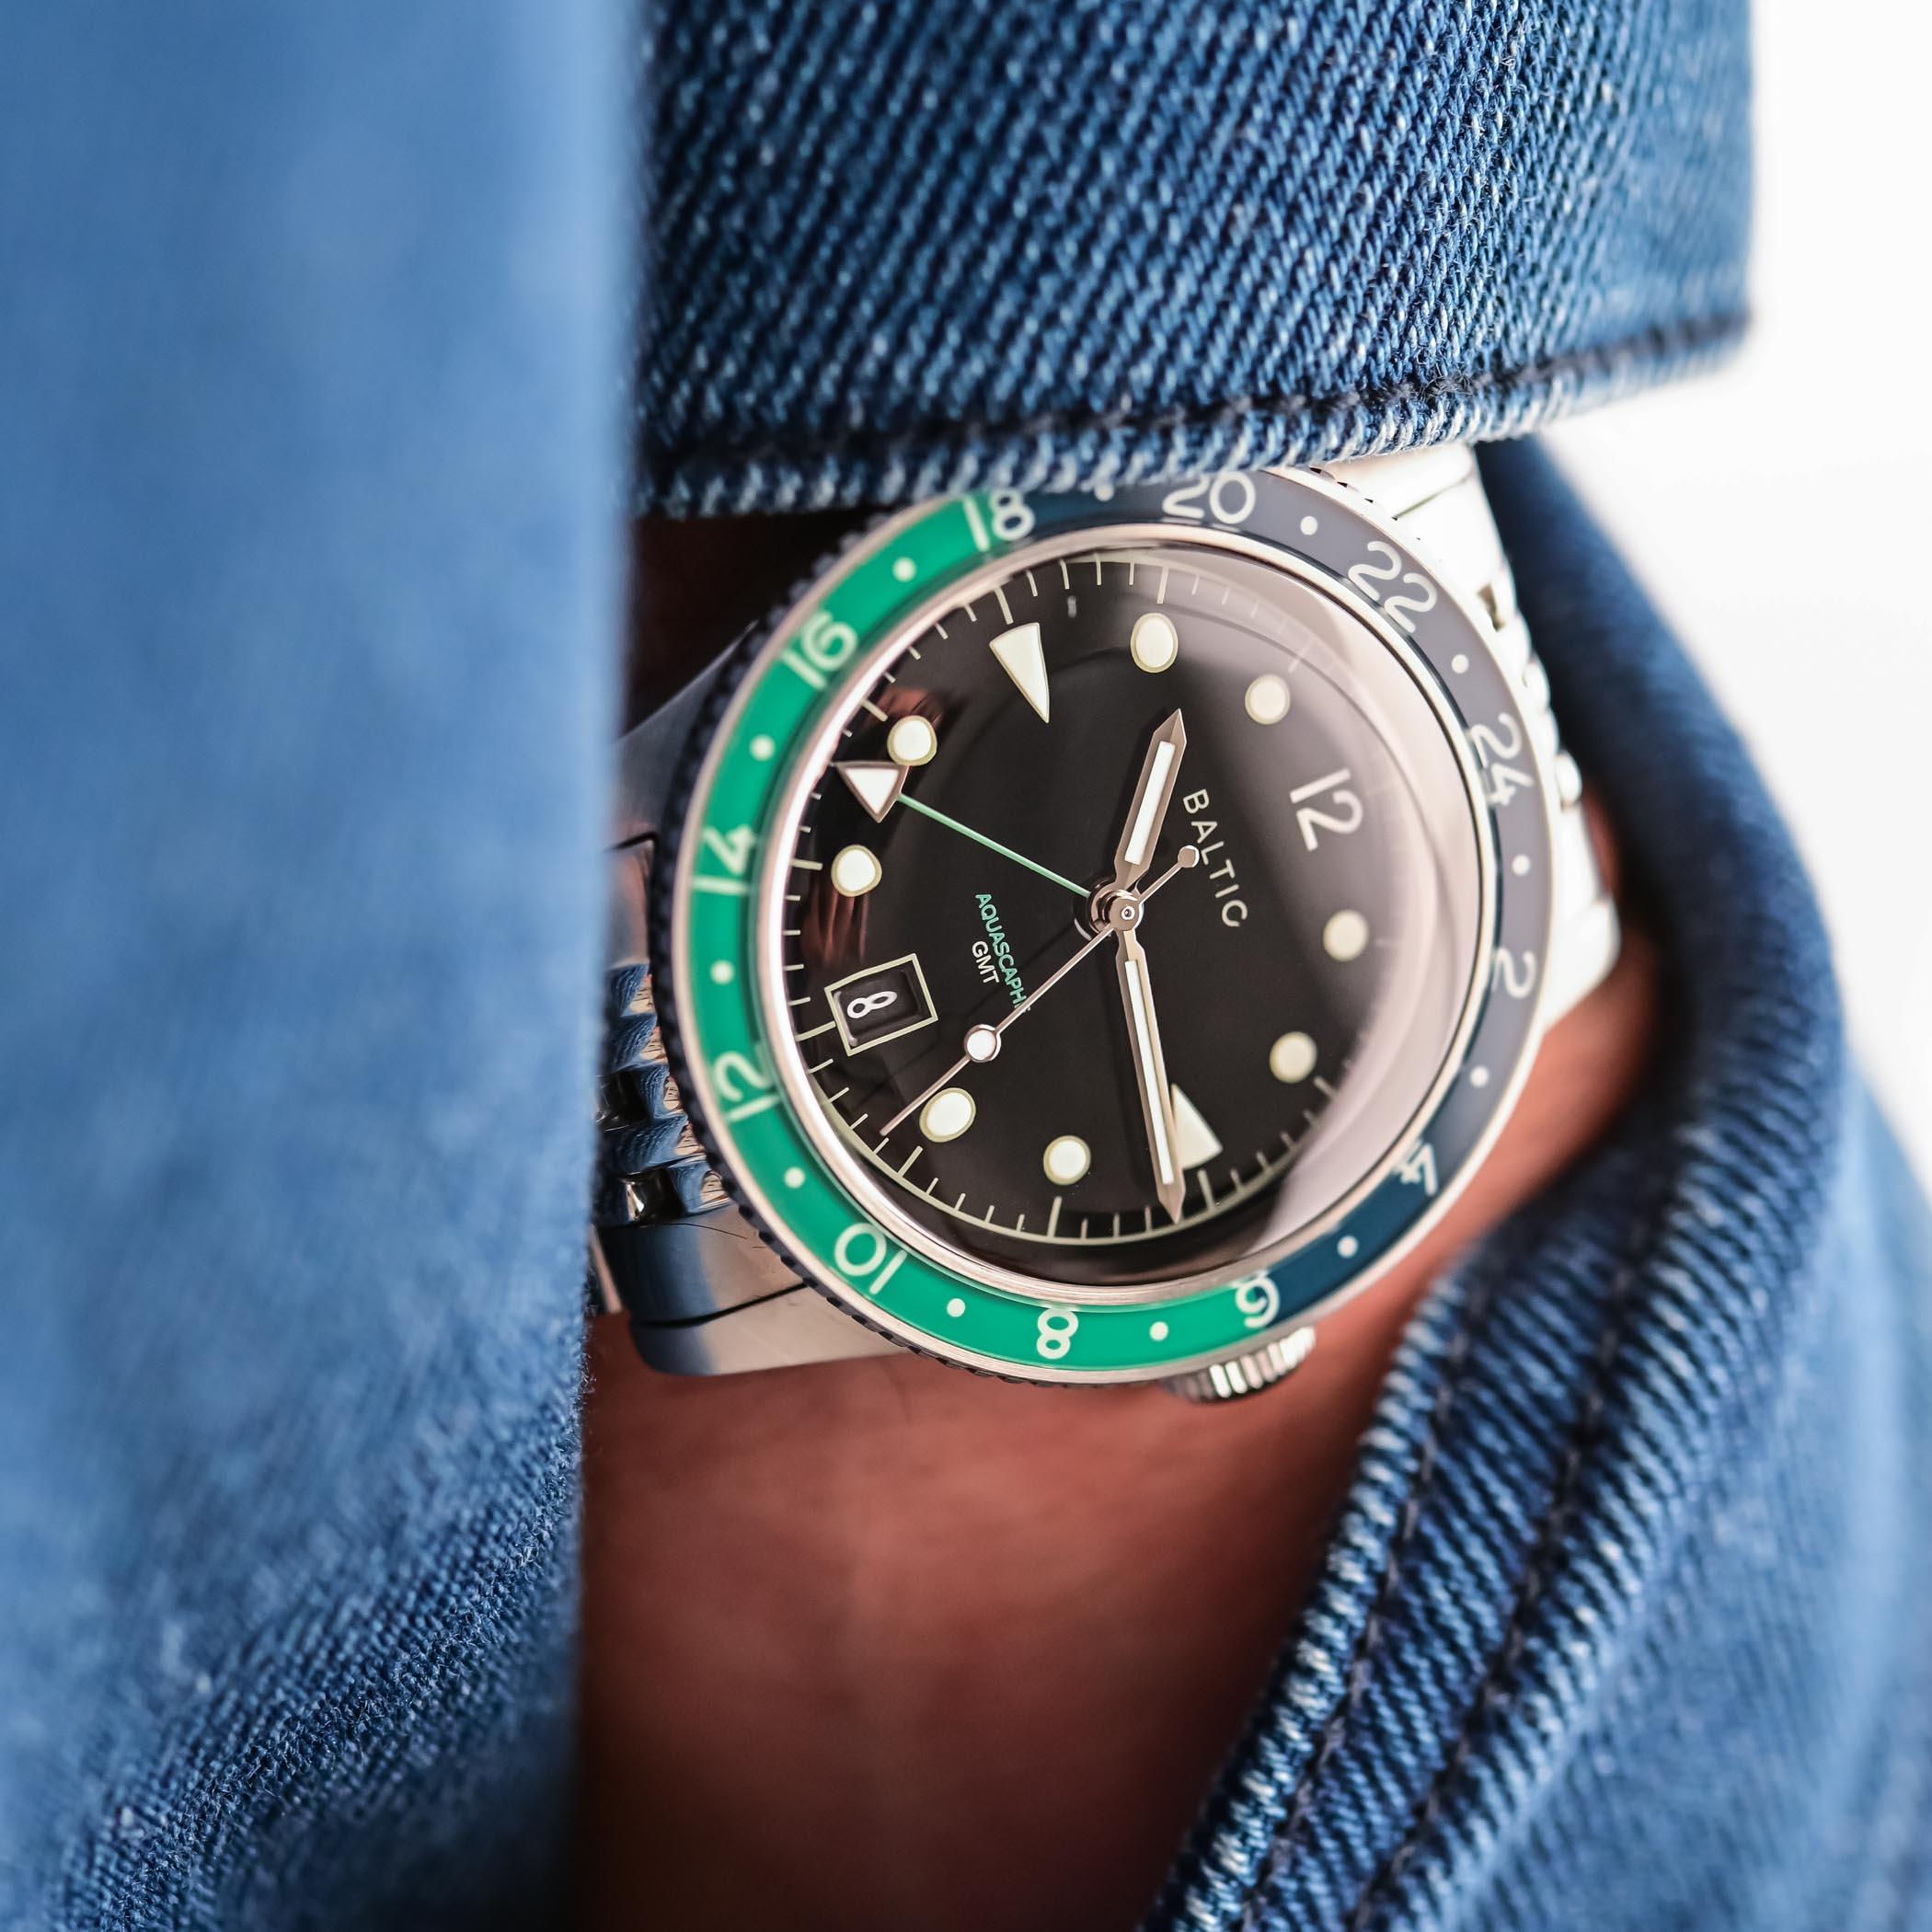 Baltic Aquascaphe GMT - Review - 3